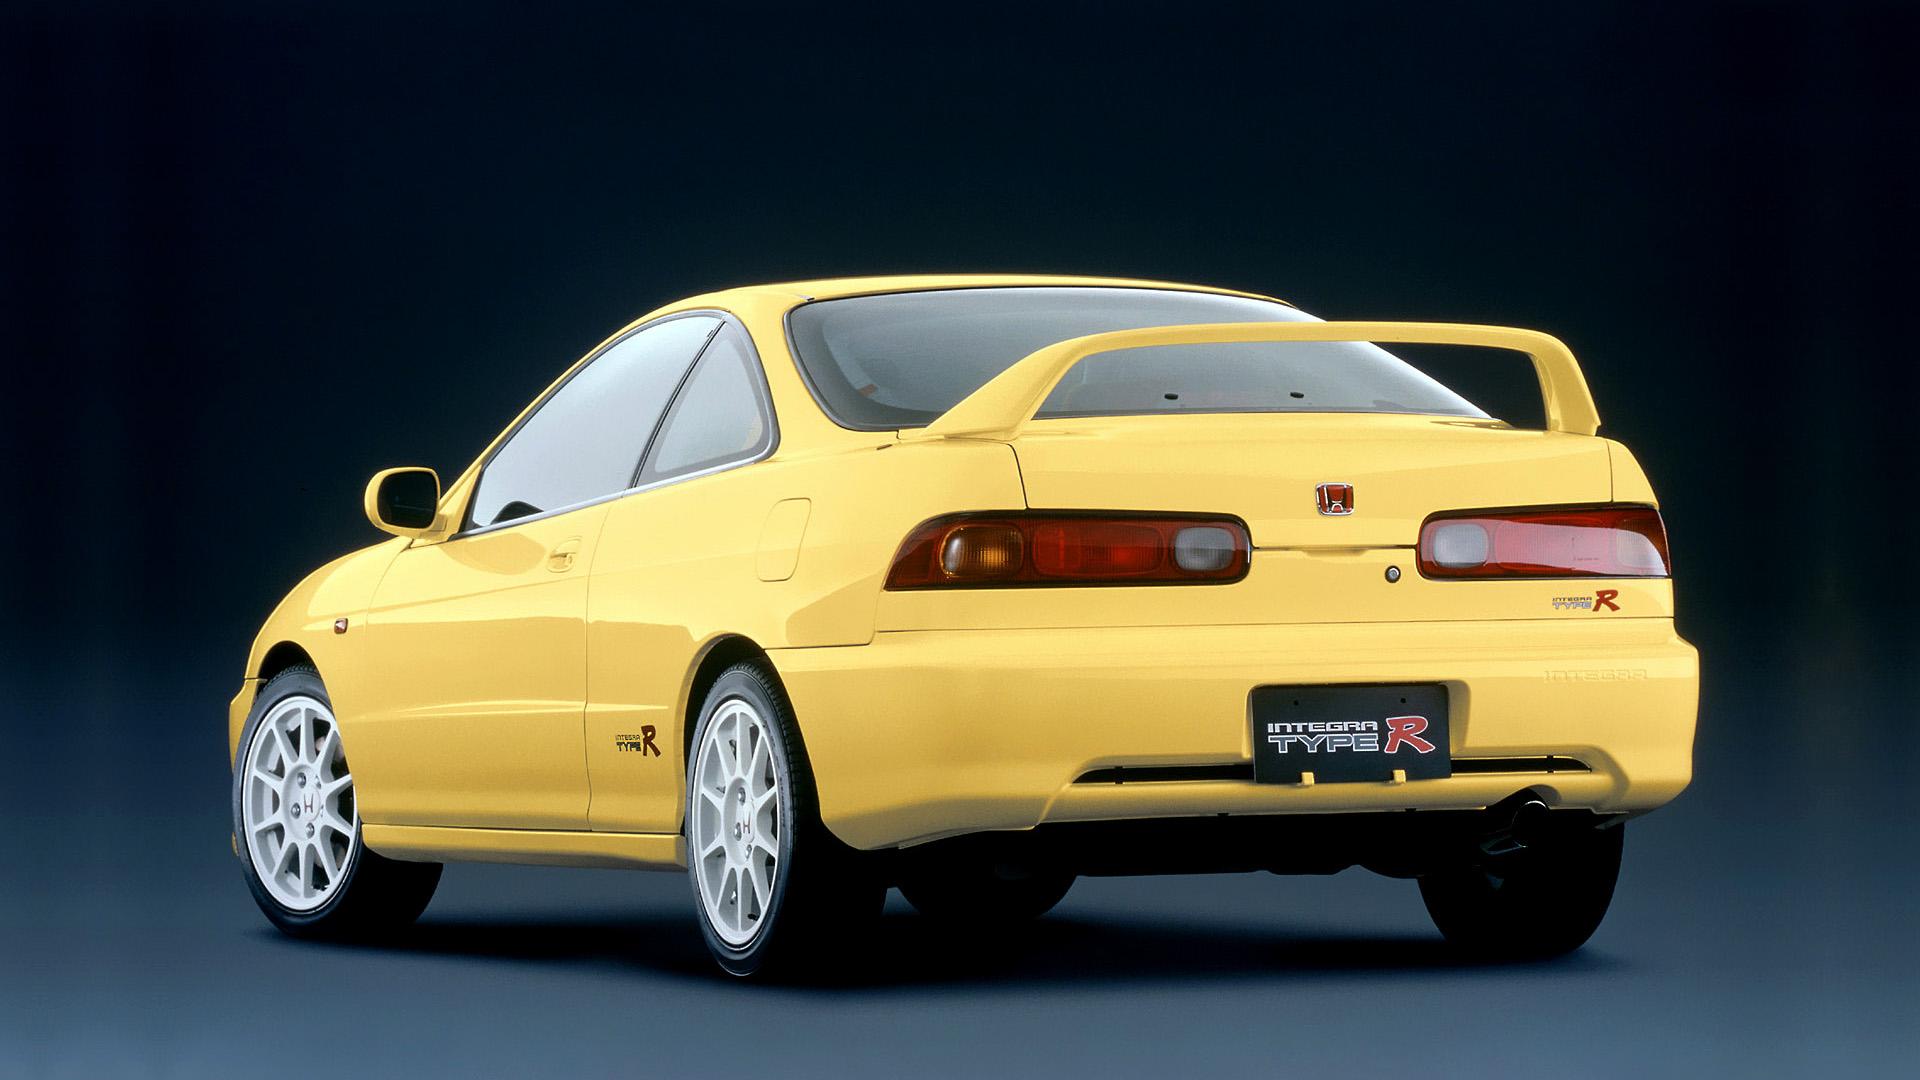 P Jdm Honda Integra Itr B C Spec likewise Acuraintegracoupe likewise Itrwhitestock B additionally Pic likewise Ad Img Large. on 1998 acura integra type r